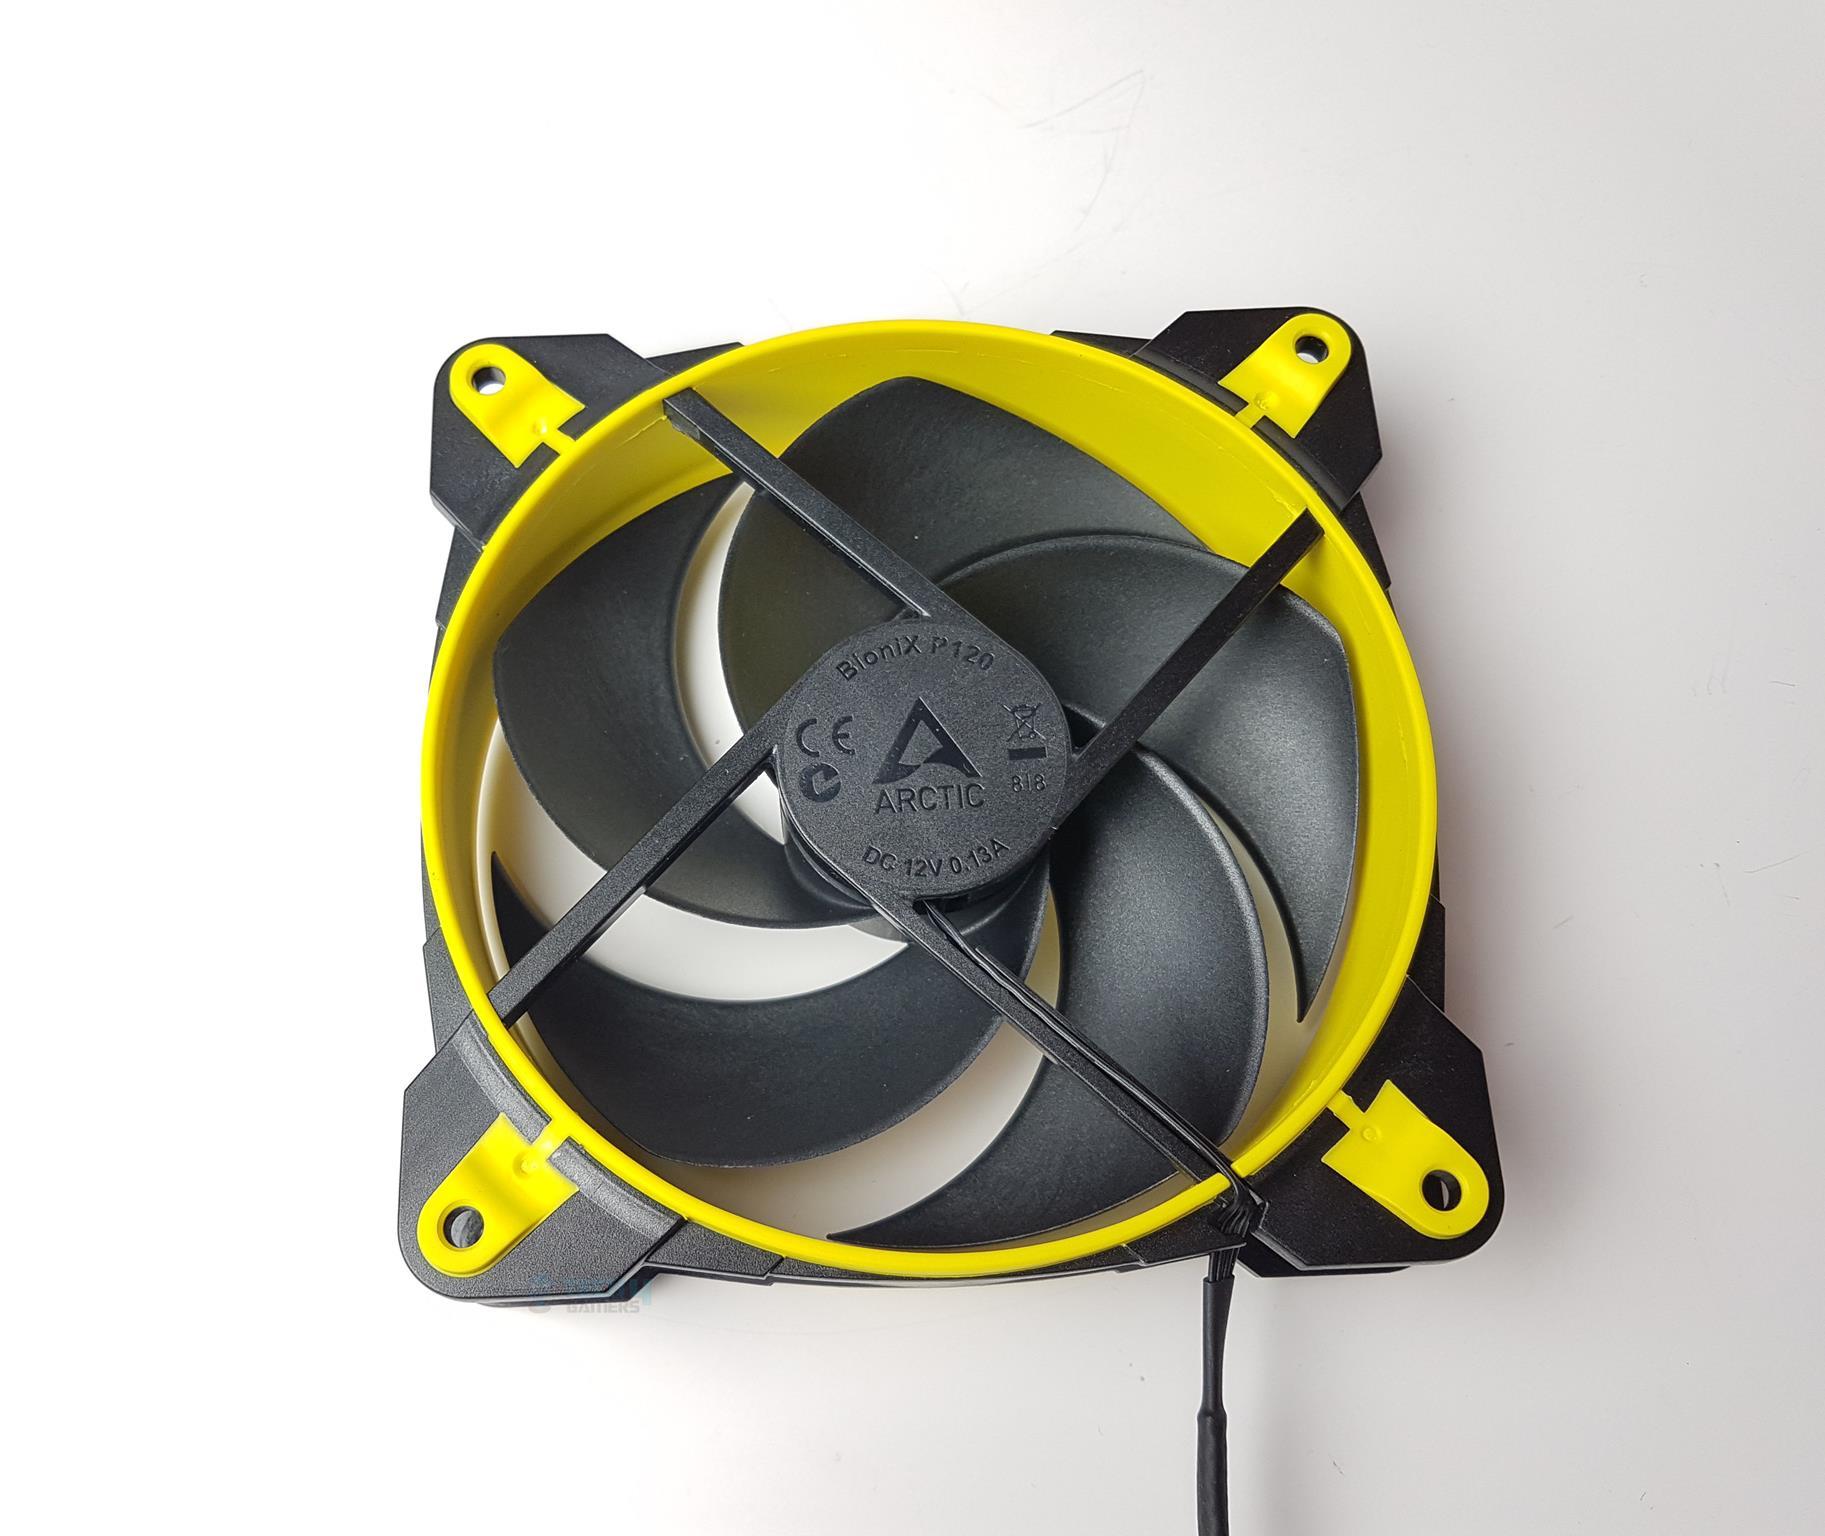 Freezer 34 eSports DUO Fan Backside